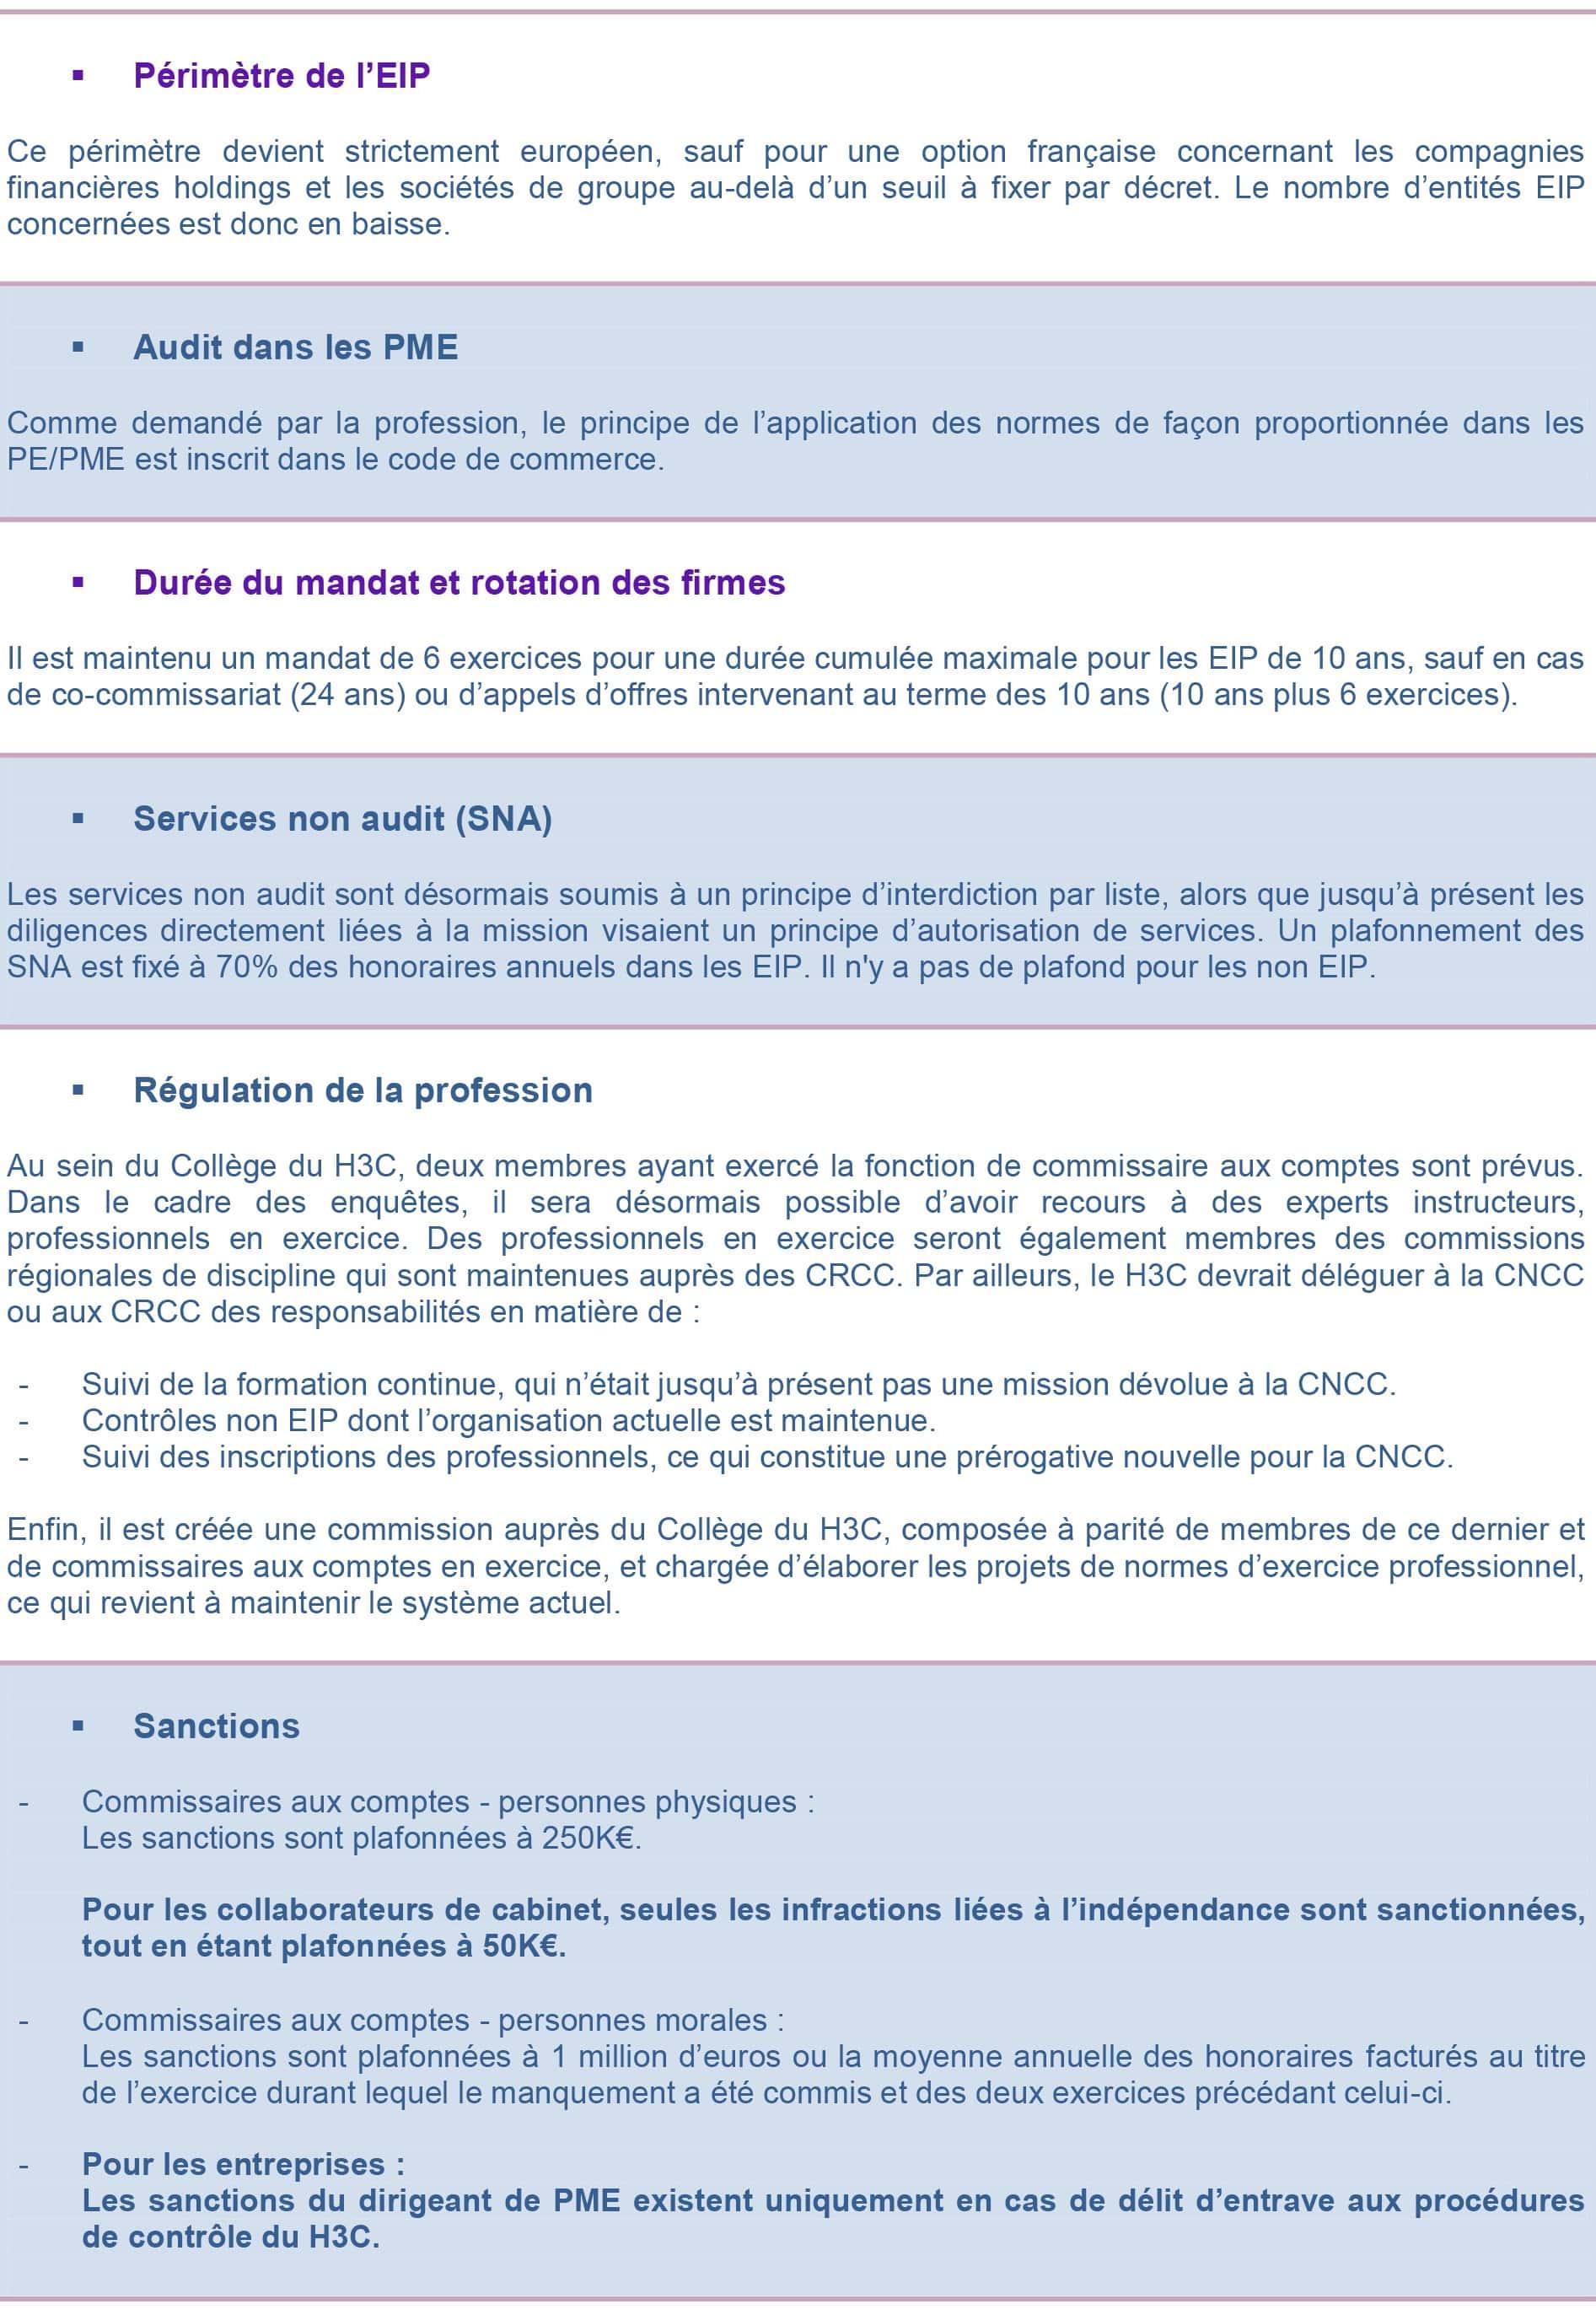 Reforme Europeenne De L Audit